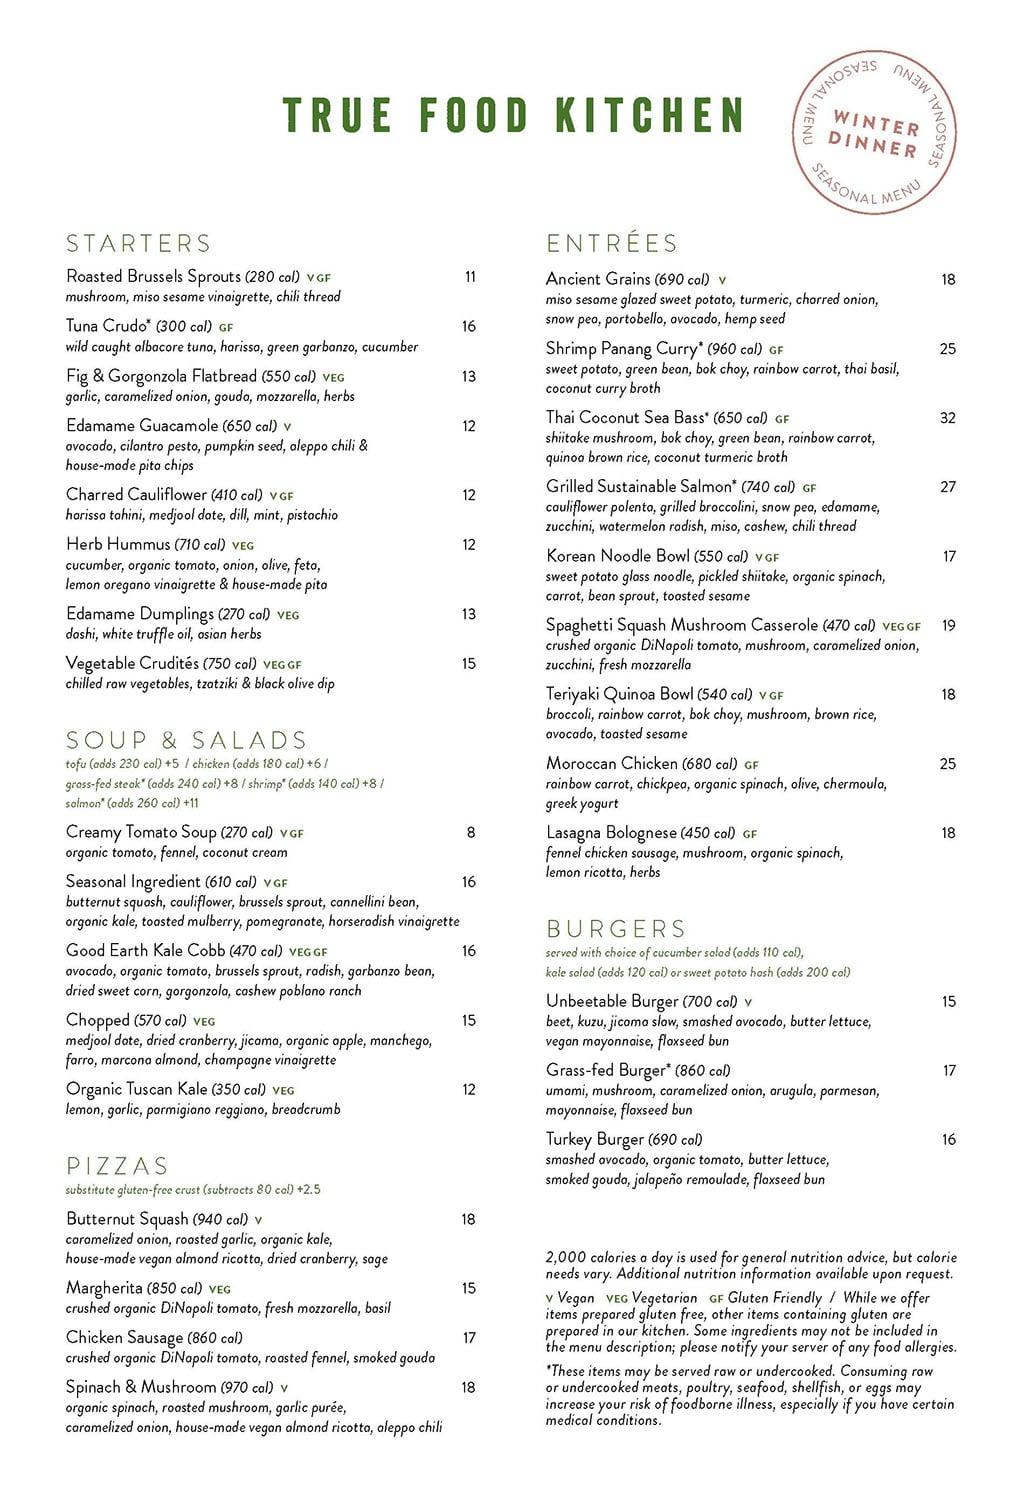 True Food Kitchen menu - dinner